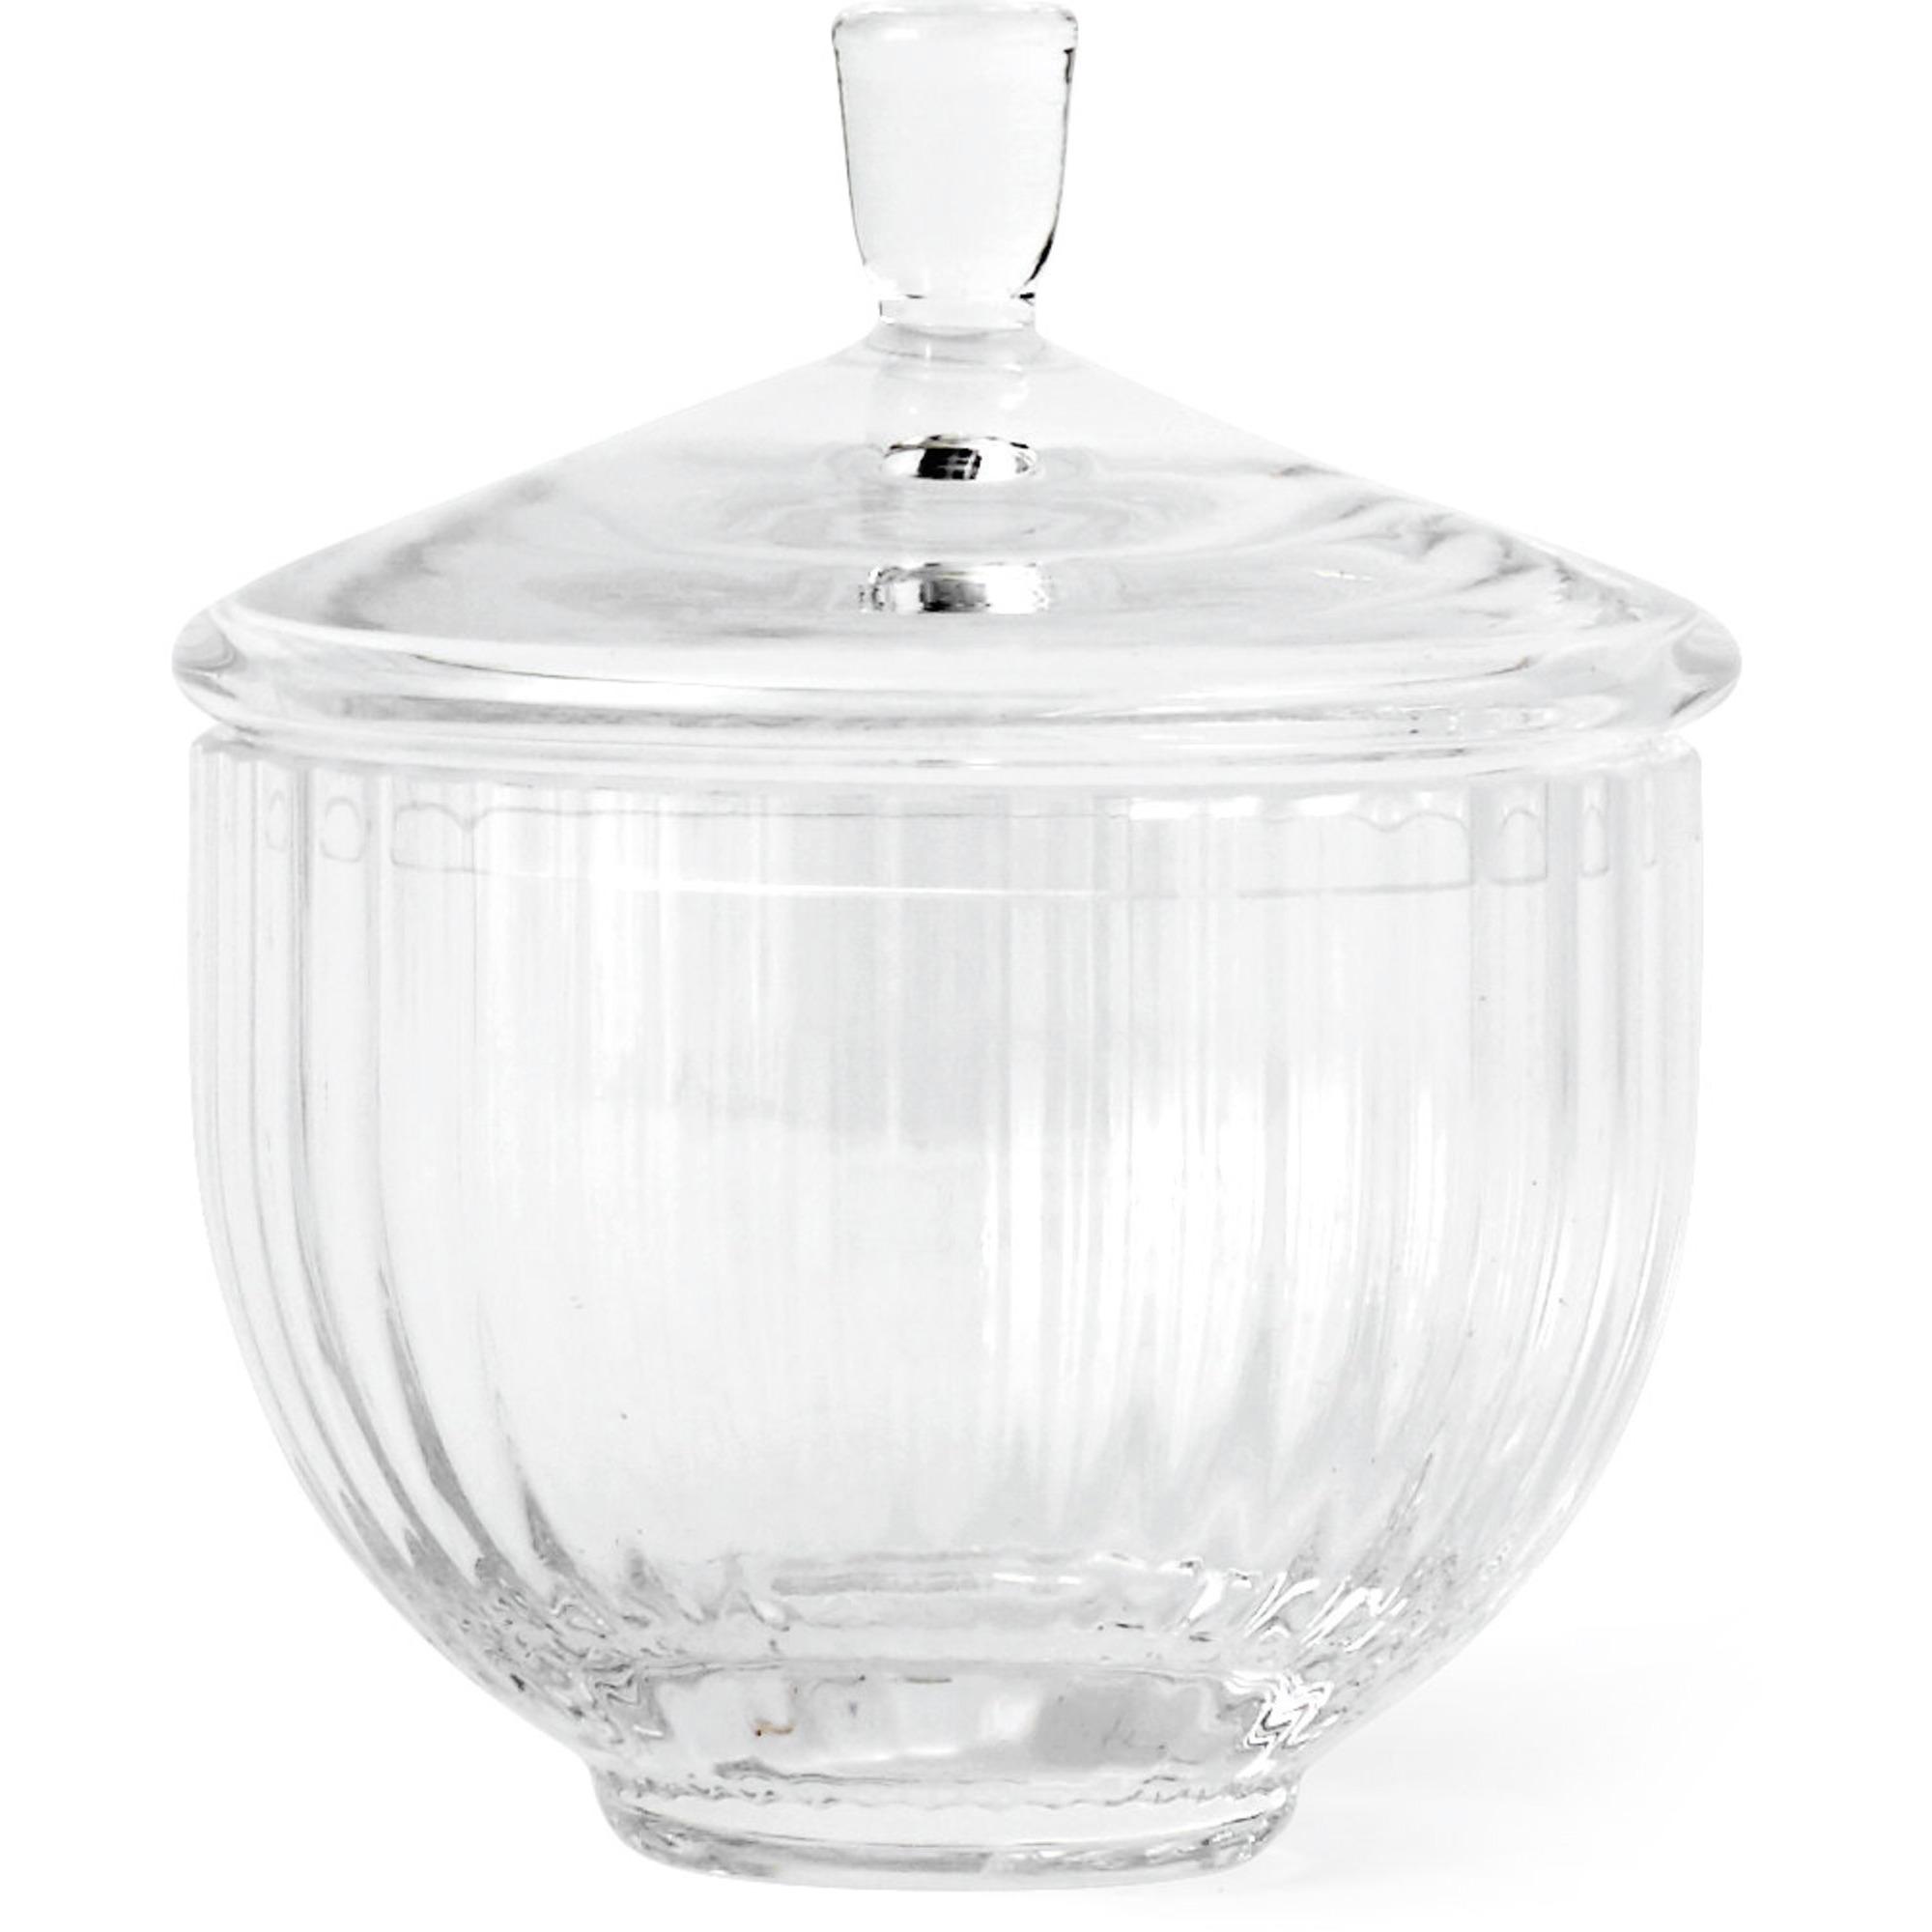 Lyngby Porcelæn Glas bonbonniere Ø 10 cm. klar